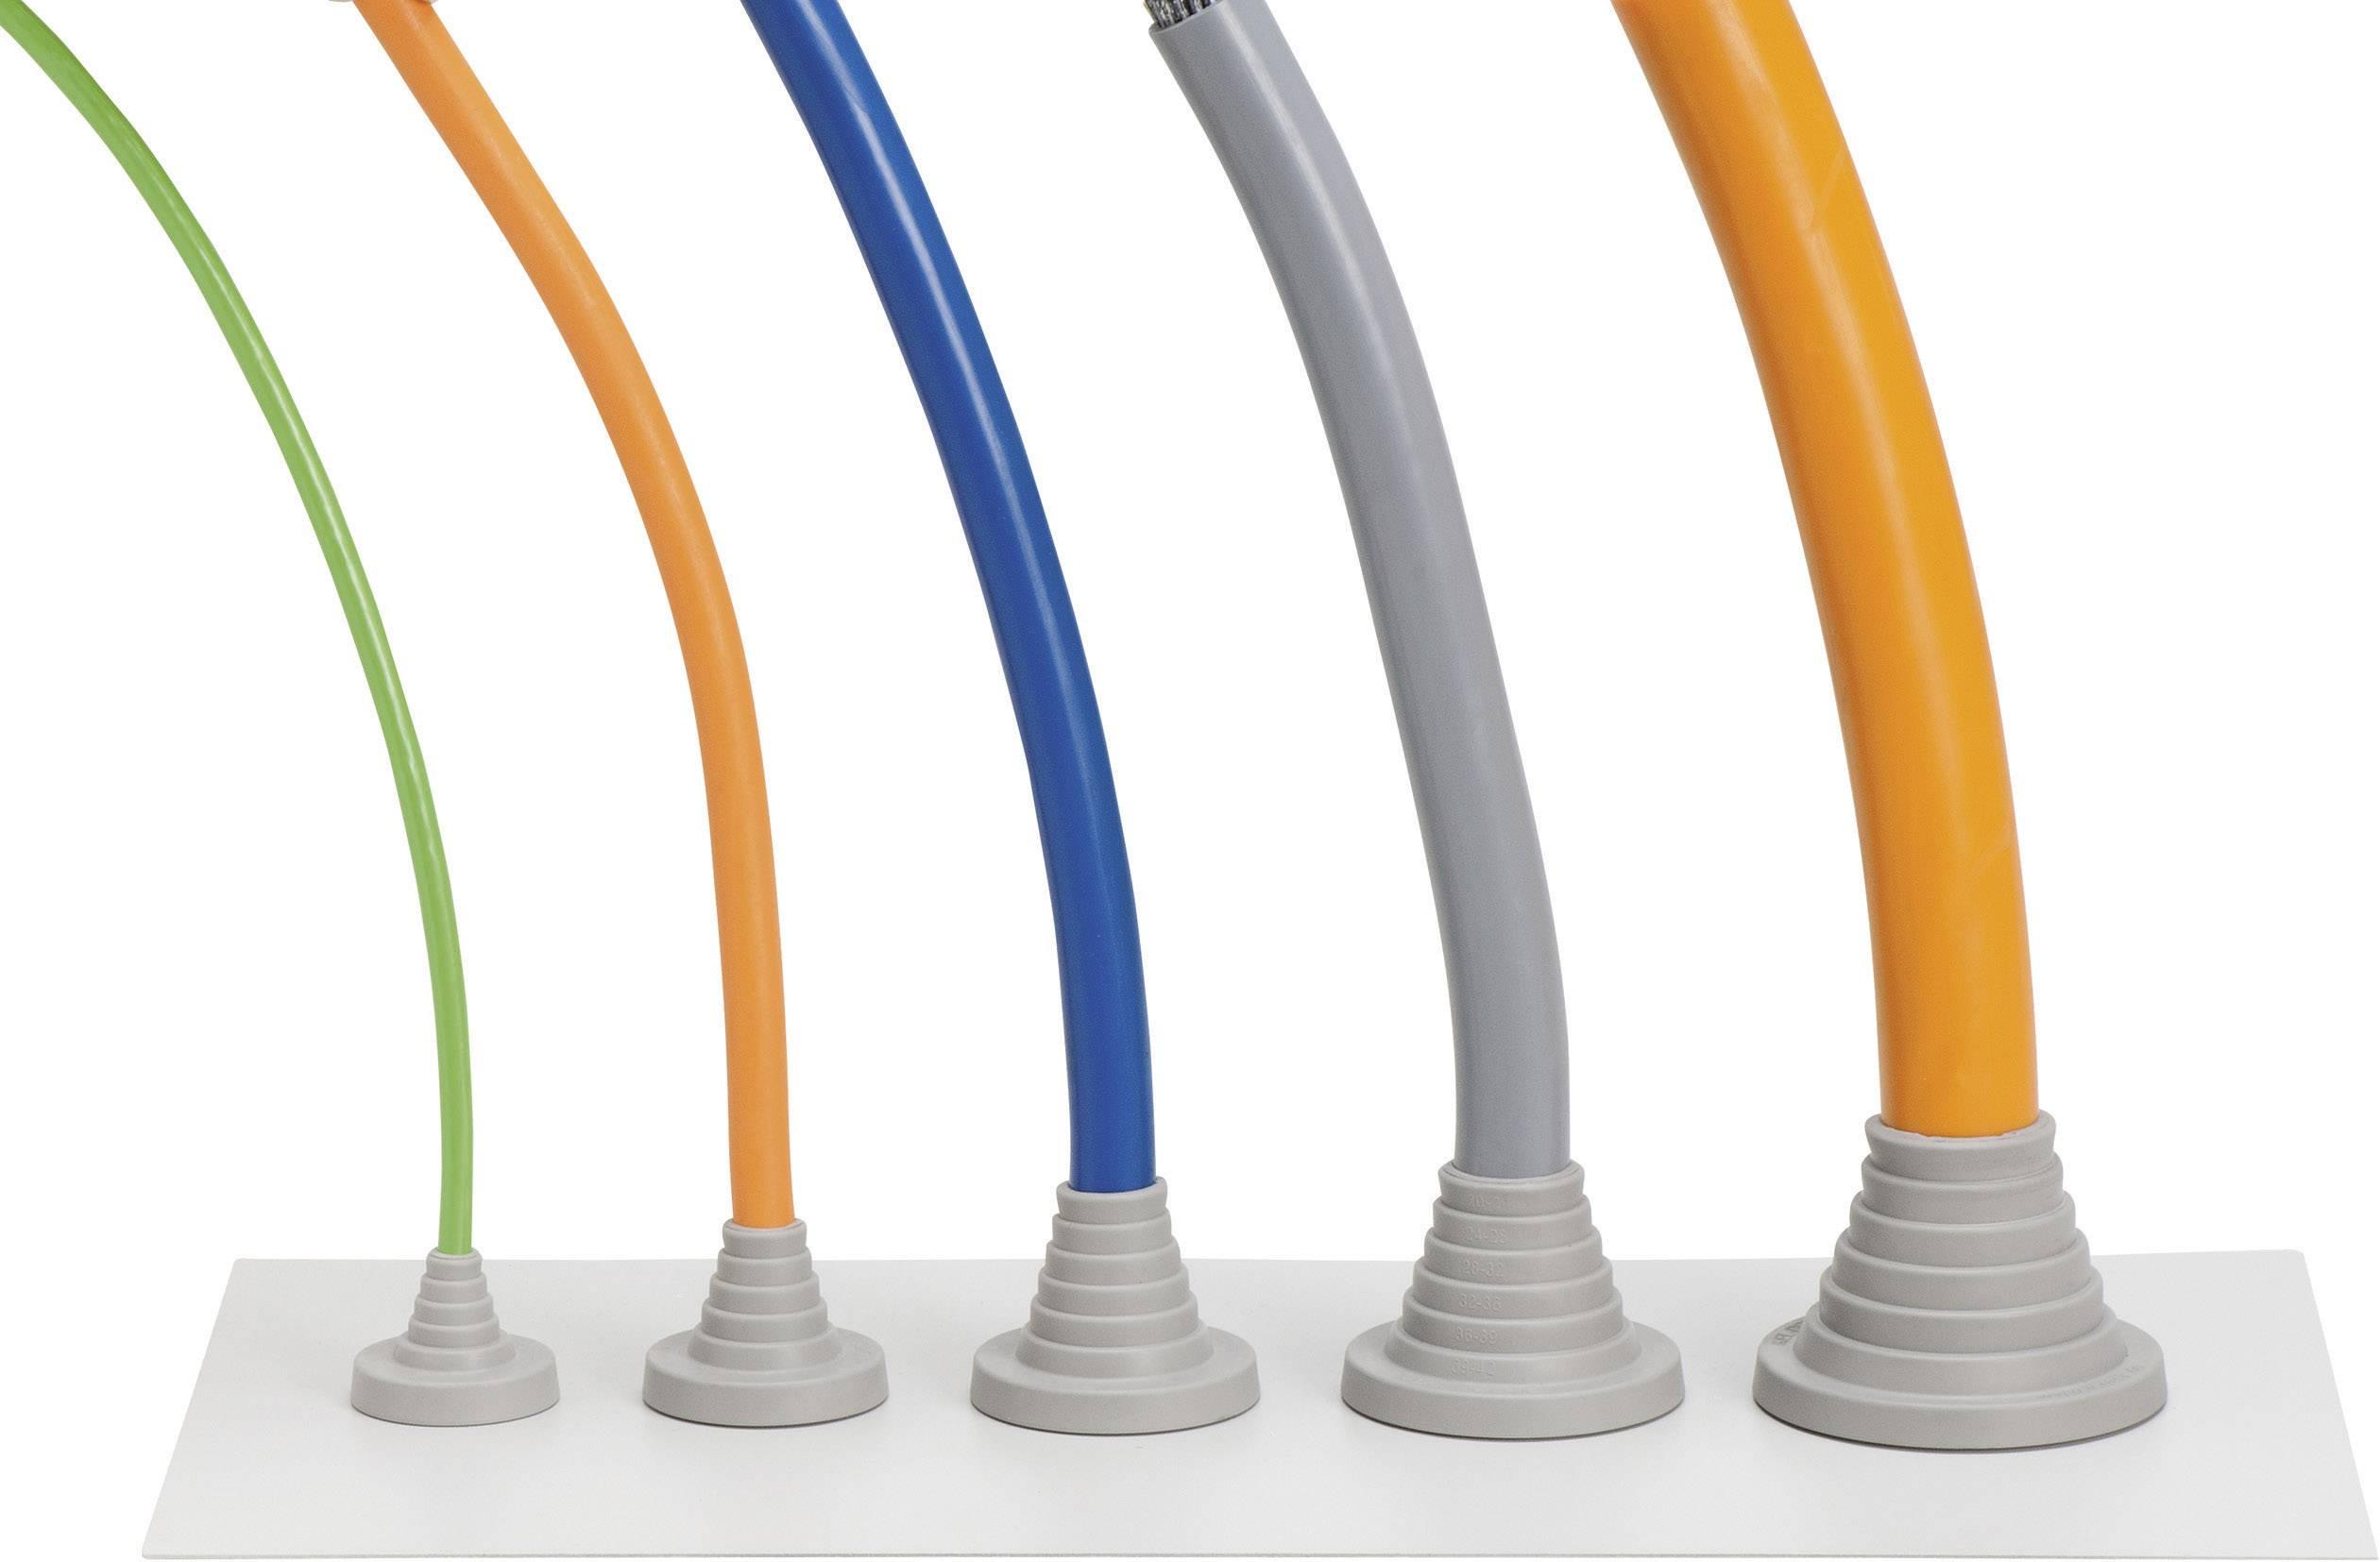 Icotek Uvodna kapa za kable KEL-DPF KEL-DPF 63/23-55 za kabel- 23 - 55 mm, velikost: M63 poliamid/elastomer, siva